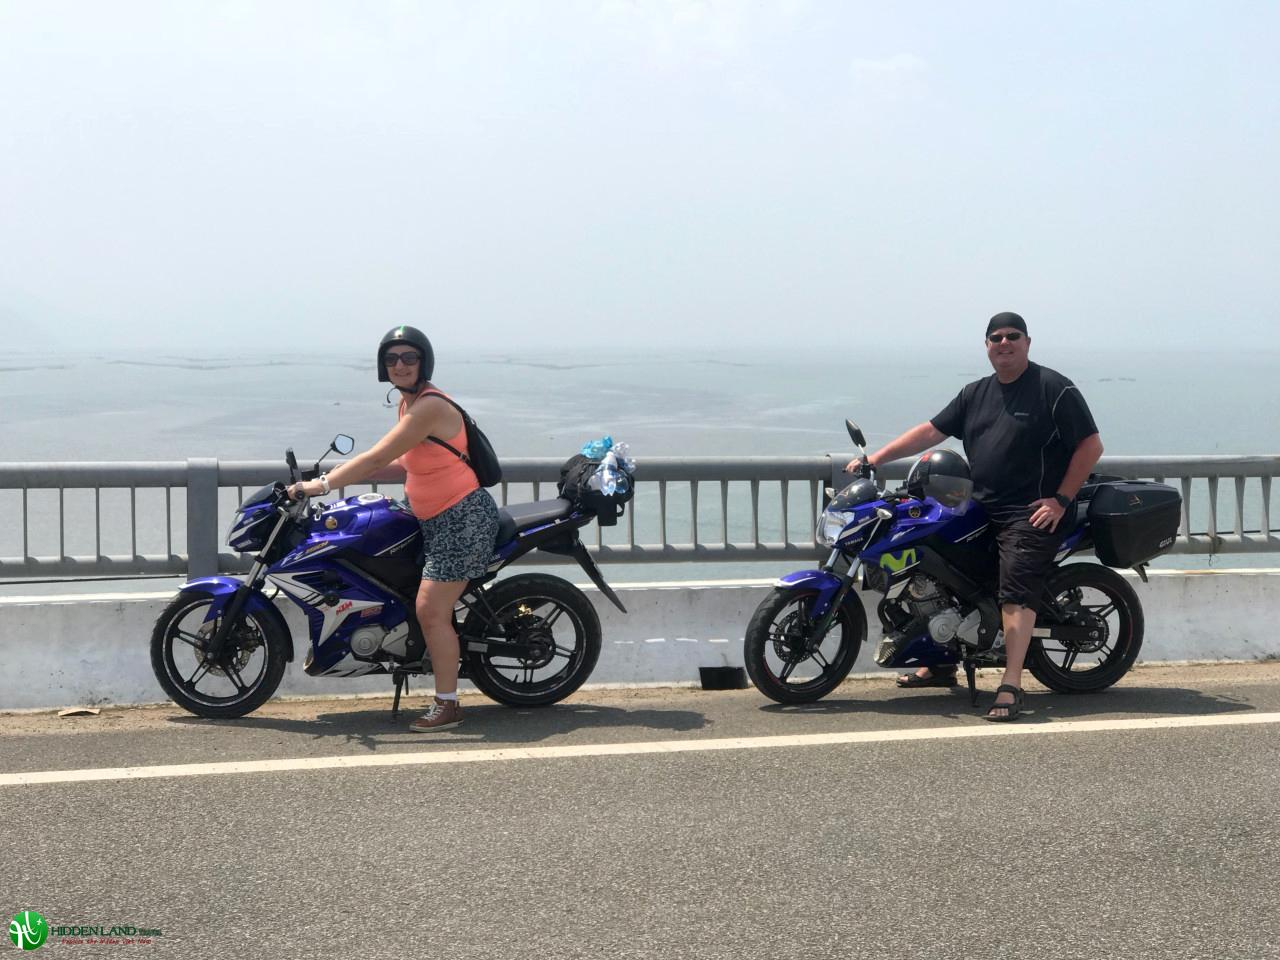 hoi-An-Hue-motorbike-tour